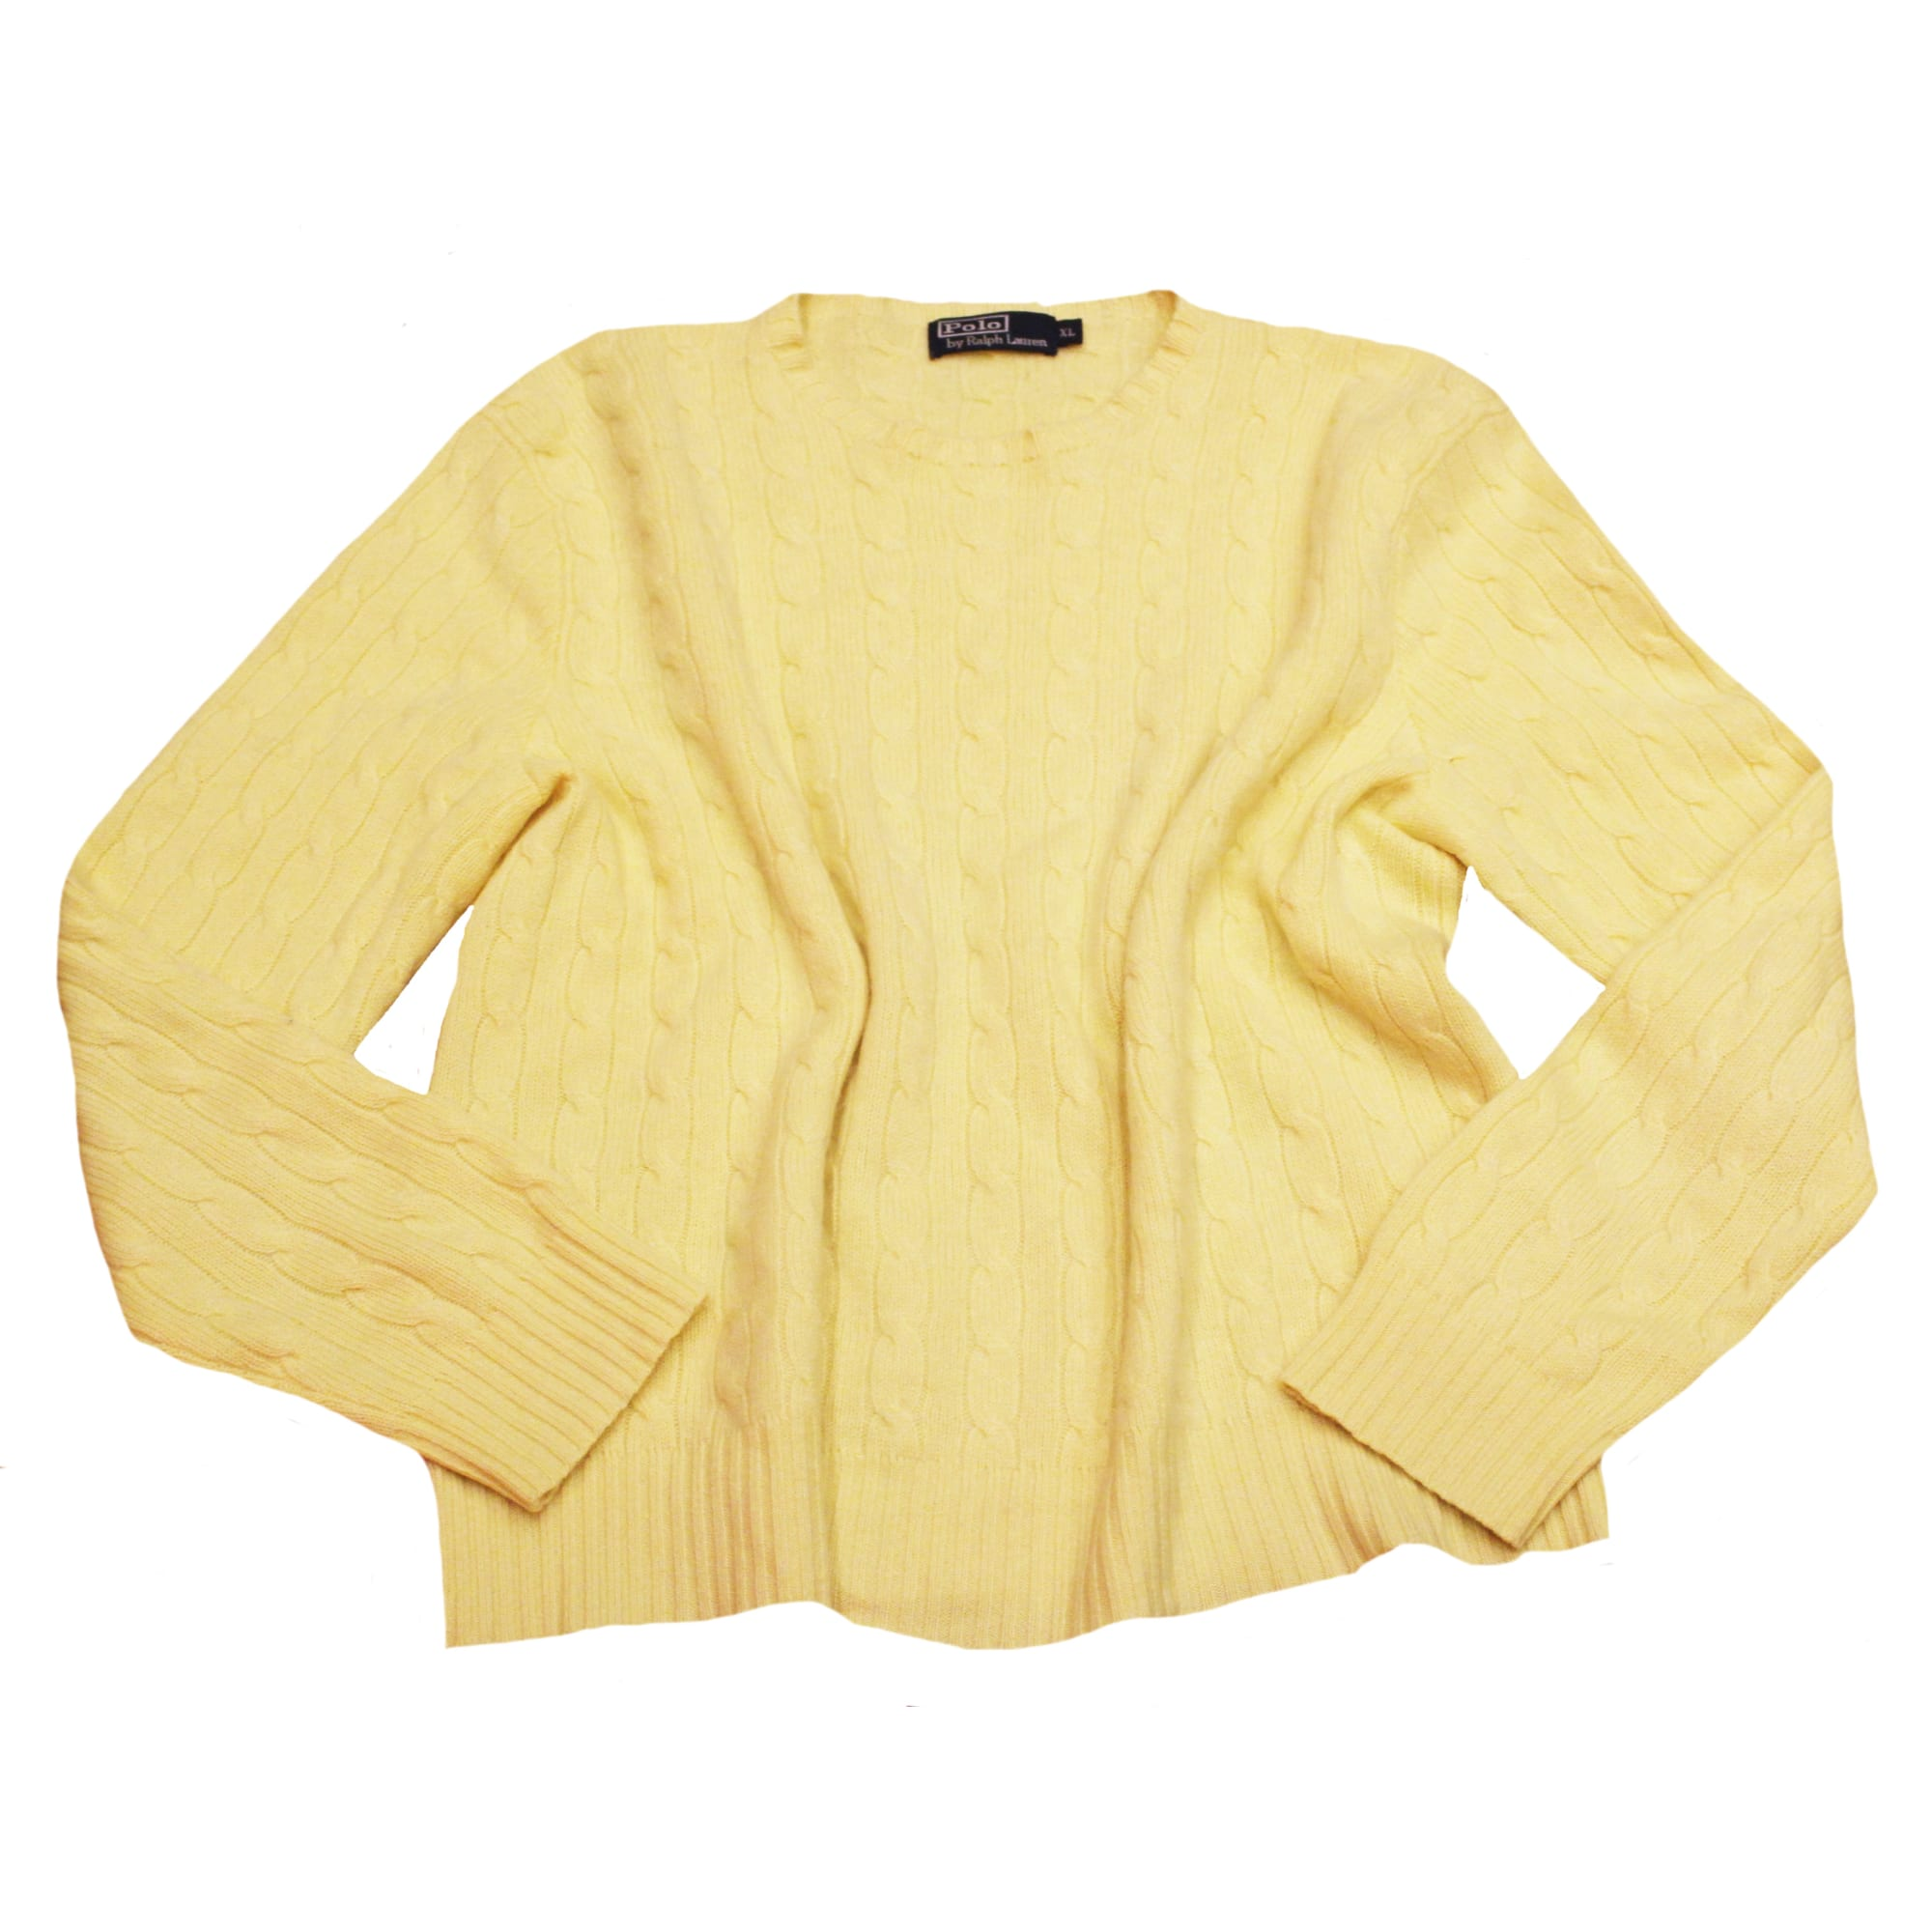 Pull RALPH LAUREN 44 (XL XXL, T5) jaune - 7261129 4052ab01ea2